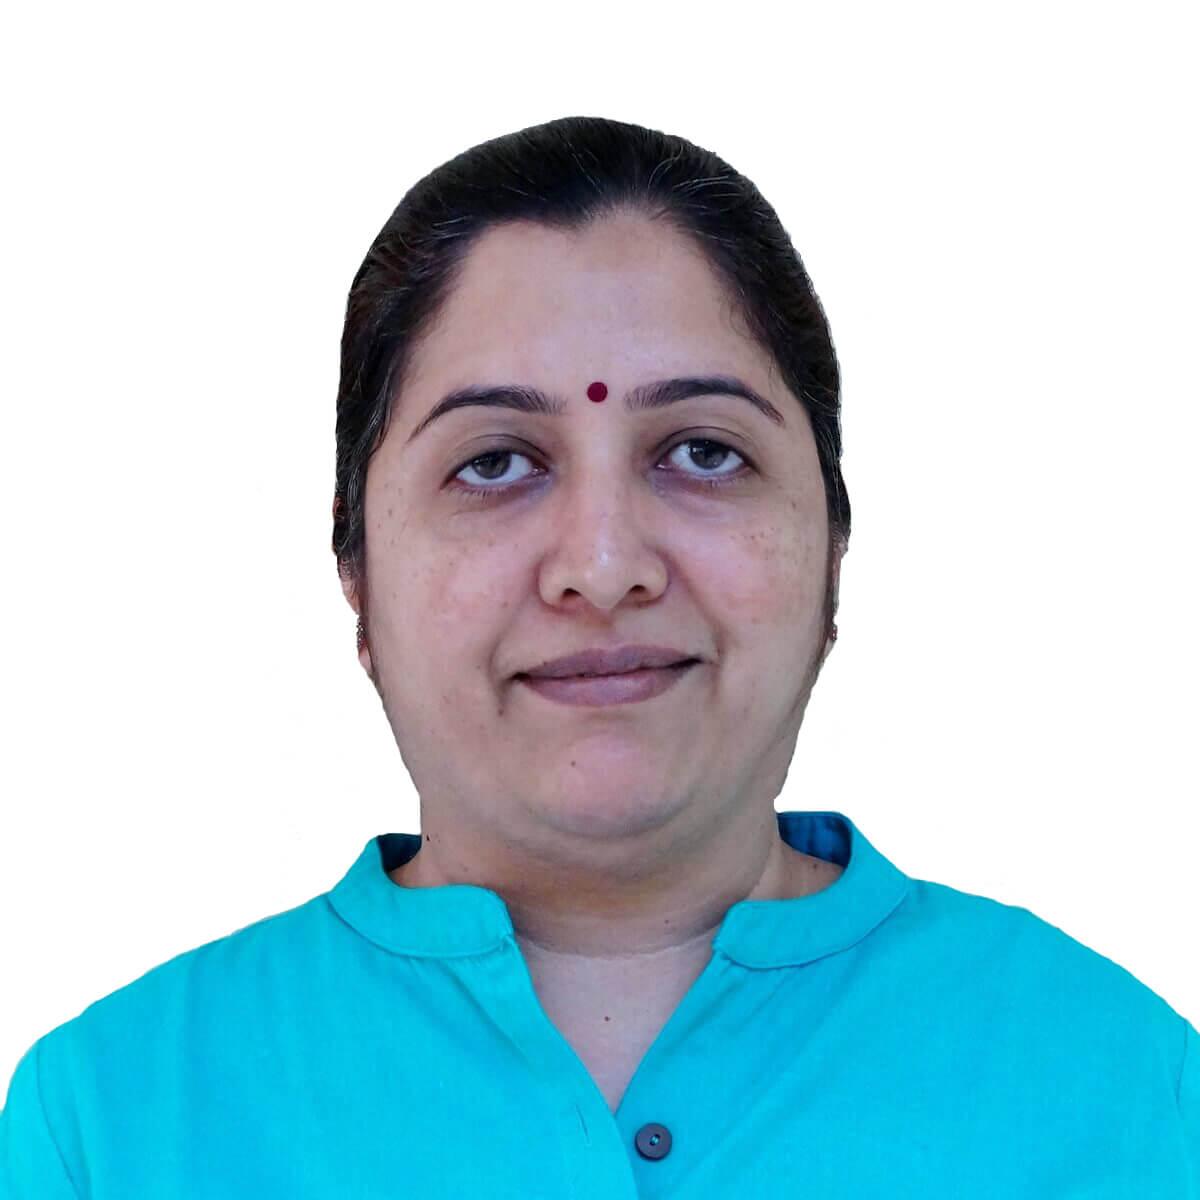 Aradhana Vipra